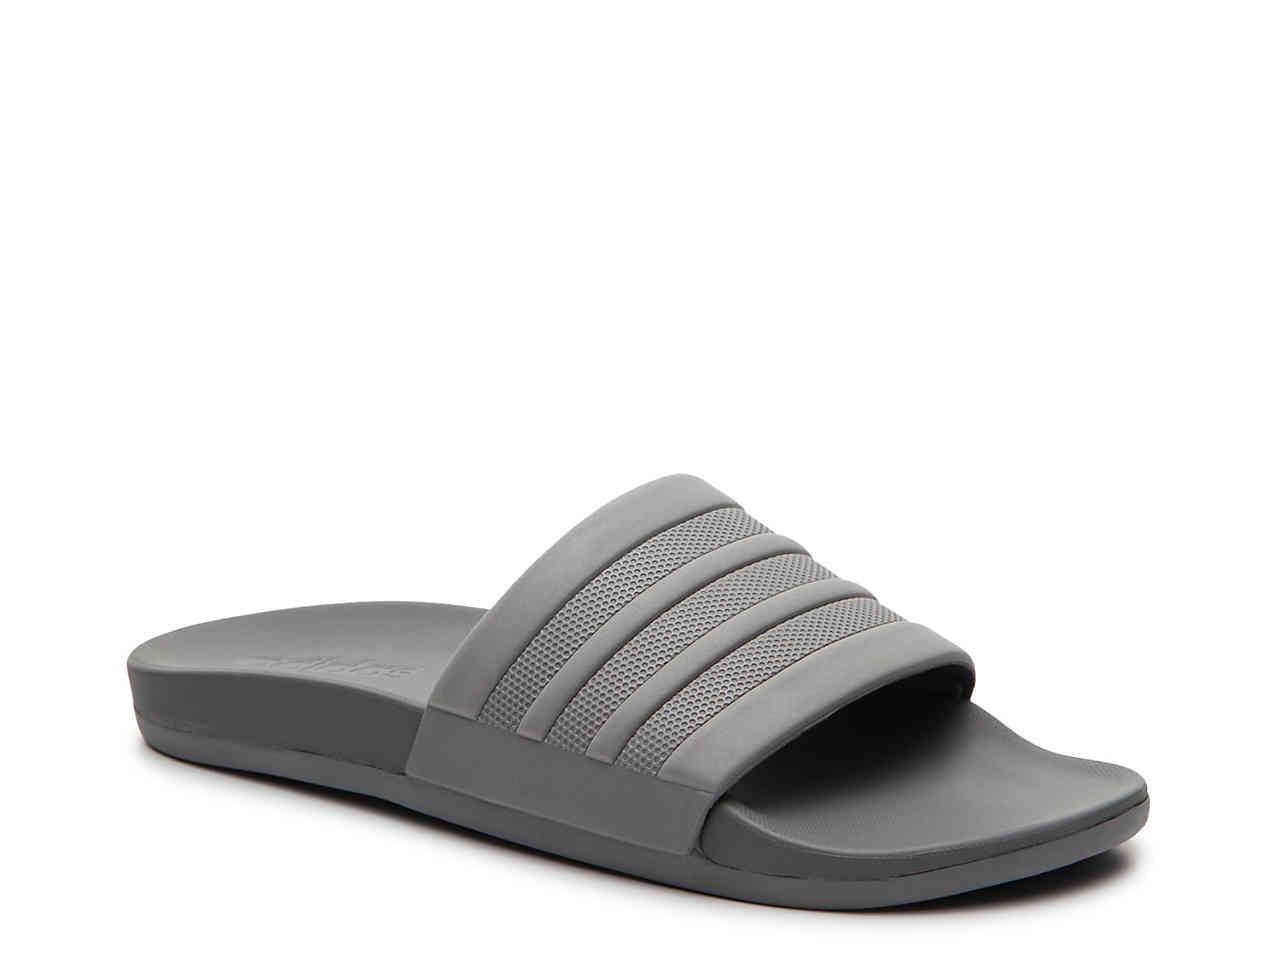 e0ac0addd473 Lyst - adidas Adilette Cloudfoam Mono Slide Sandal in Gray for Men